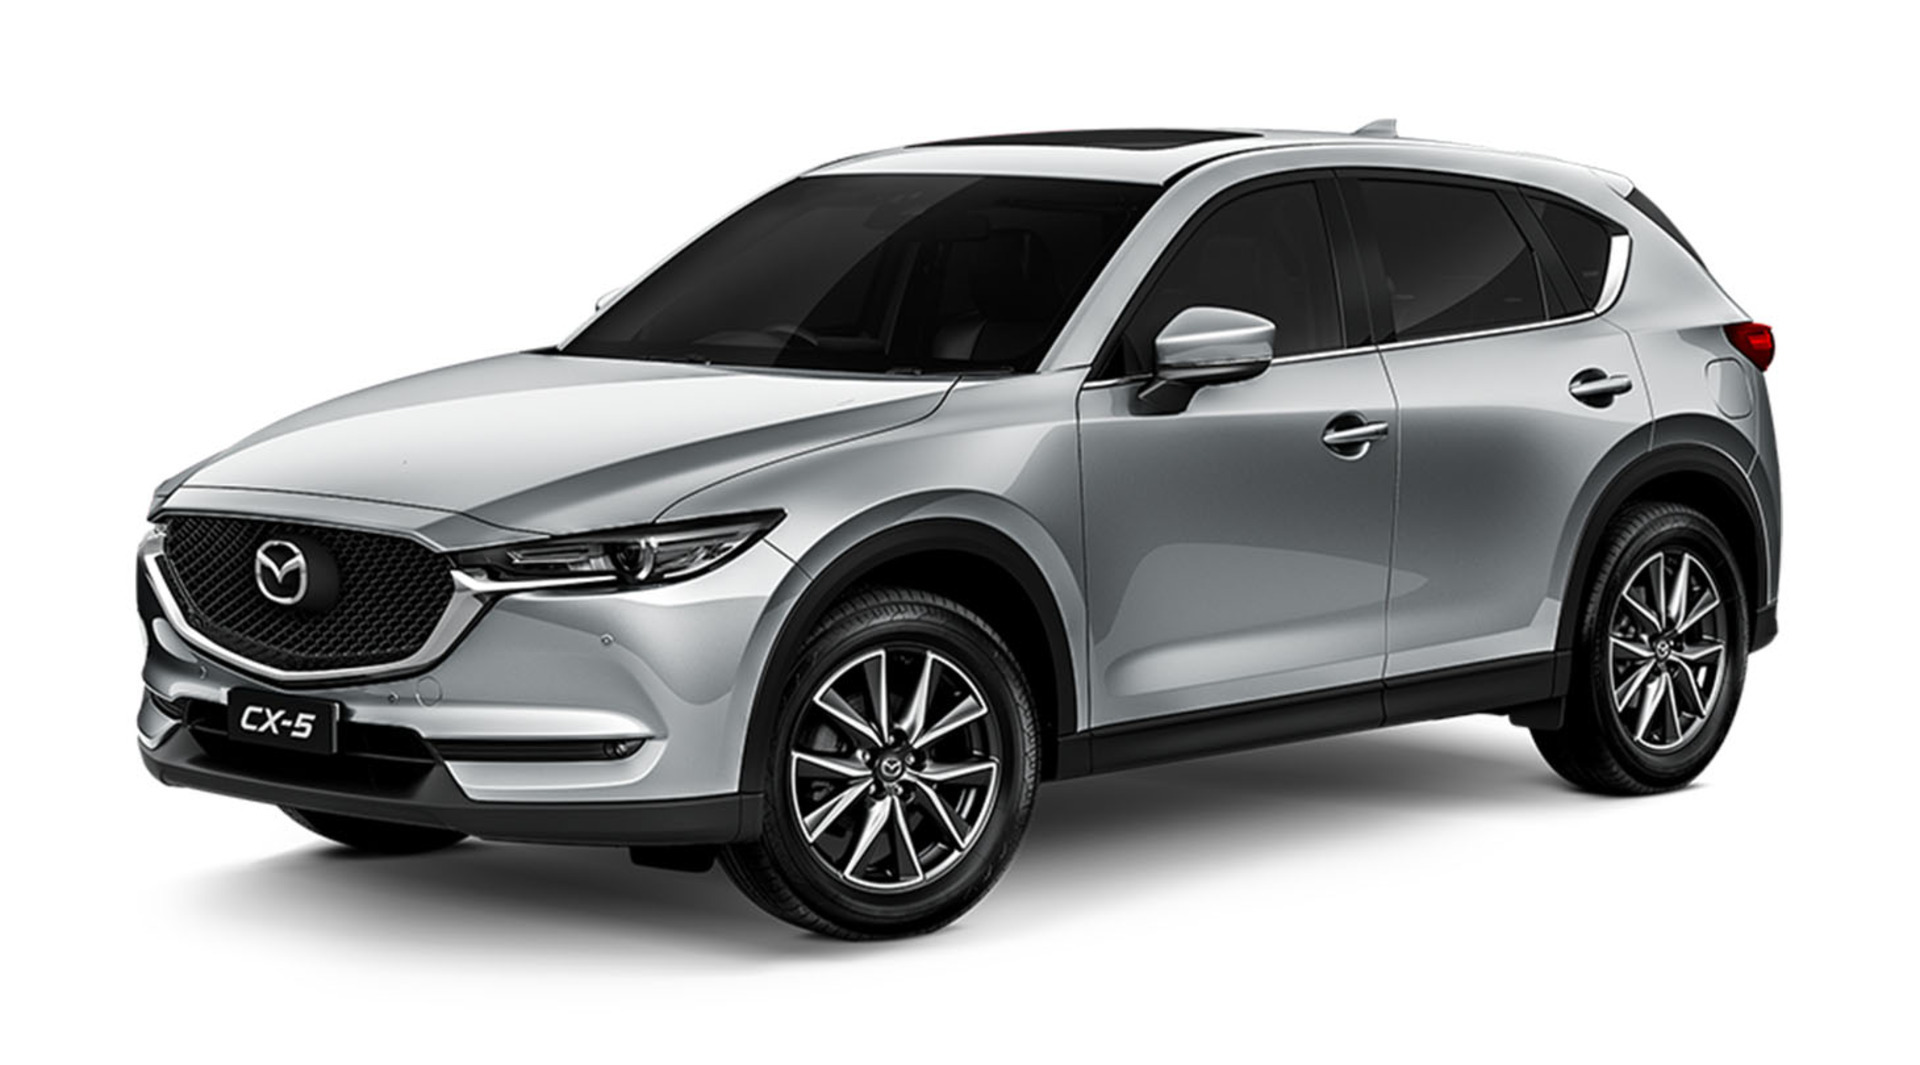 2,0 SKYACTIV-G AWD Premium Plus 6AT 5ov QN1